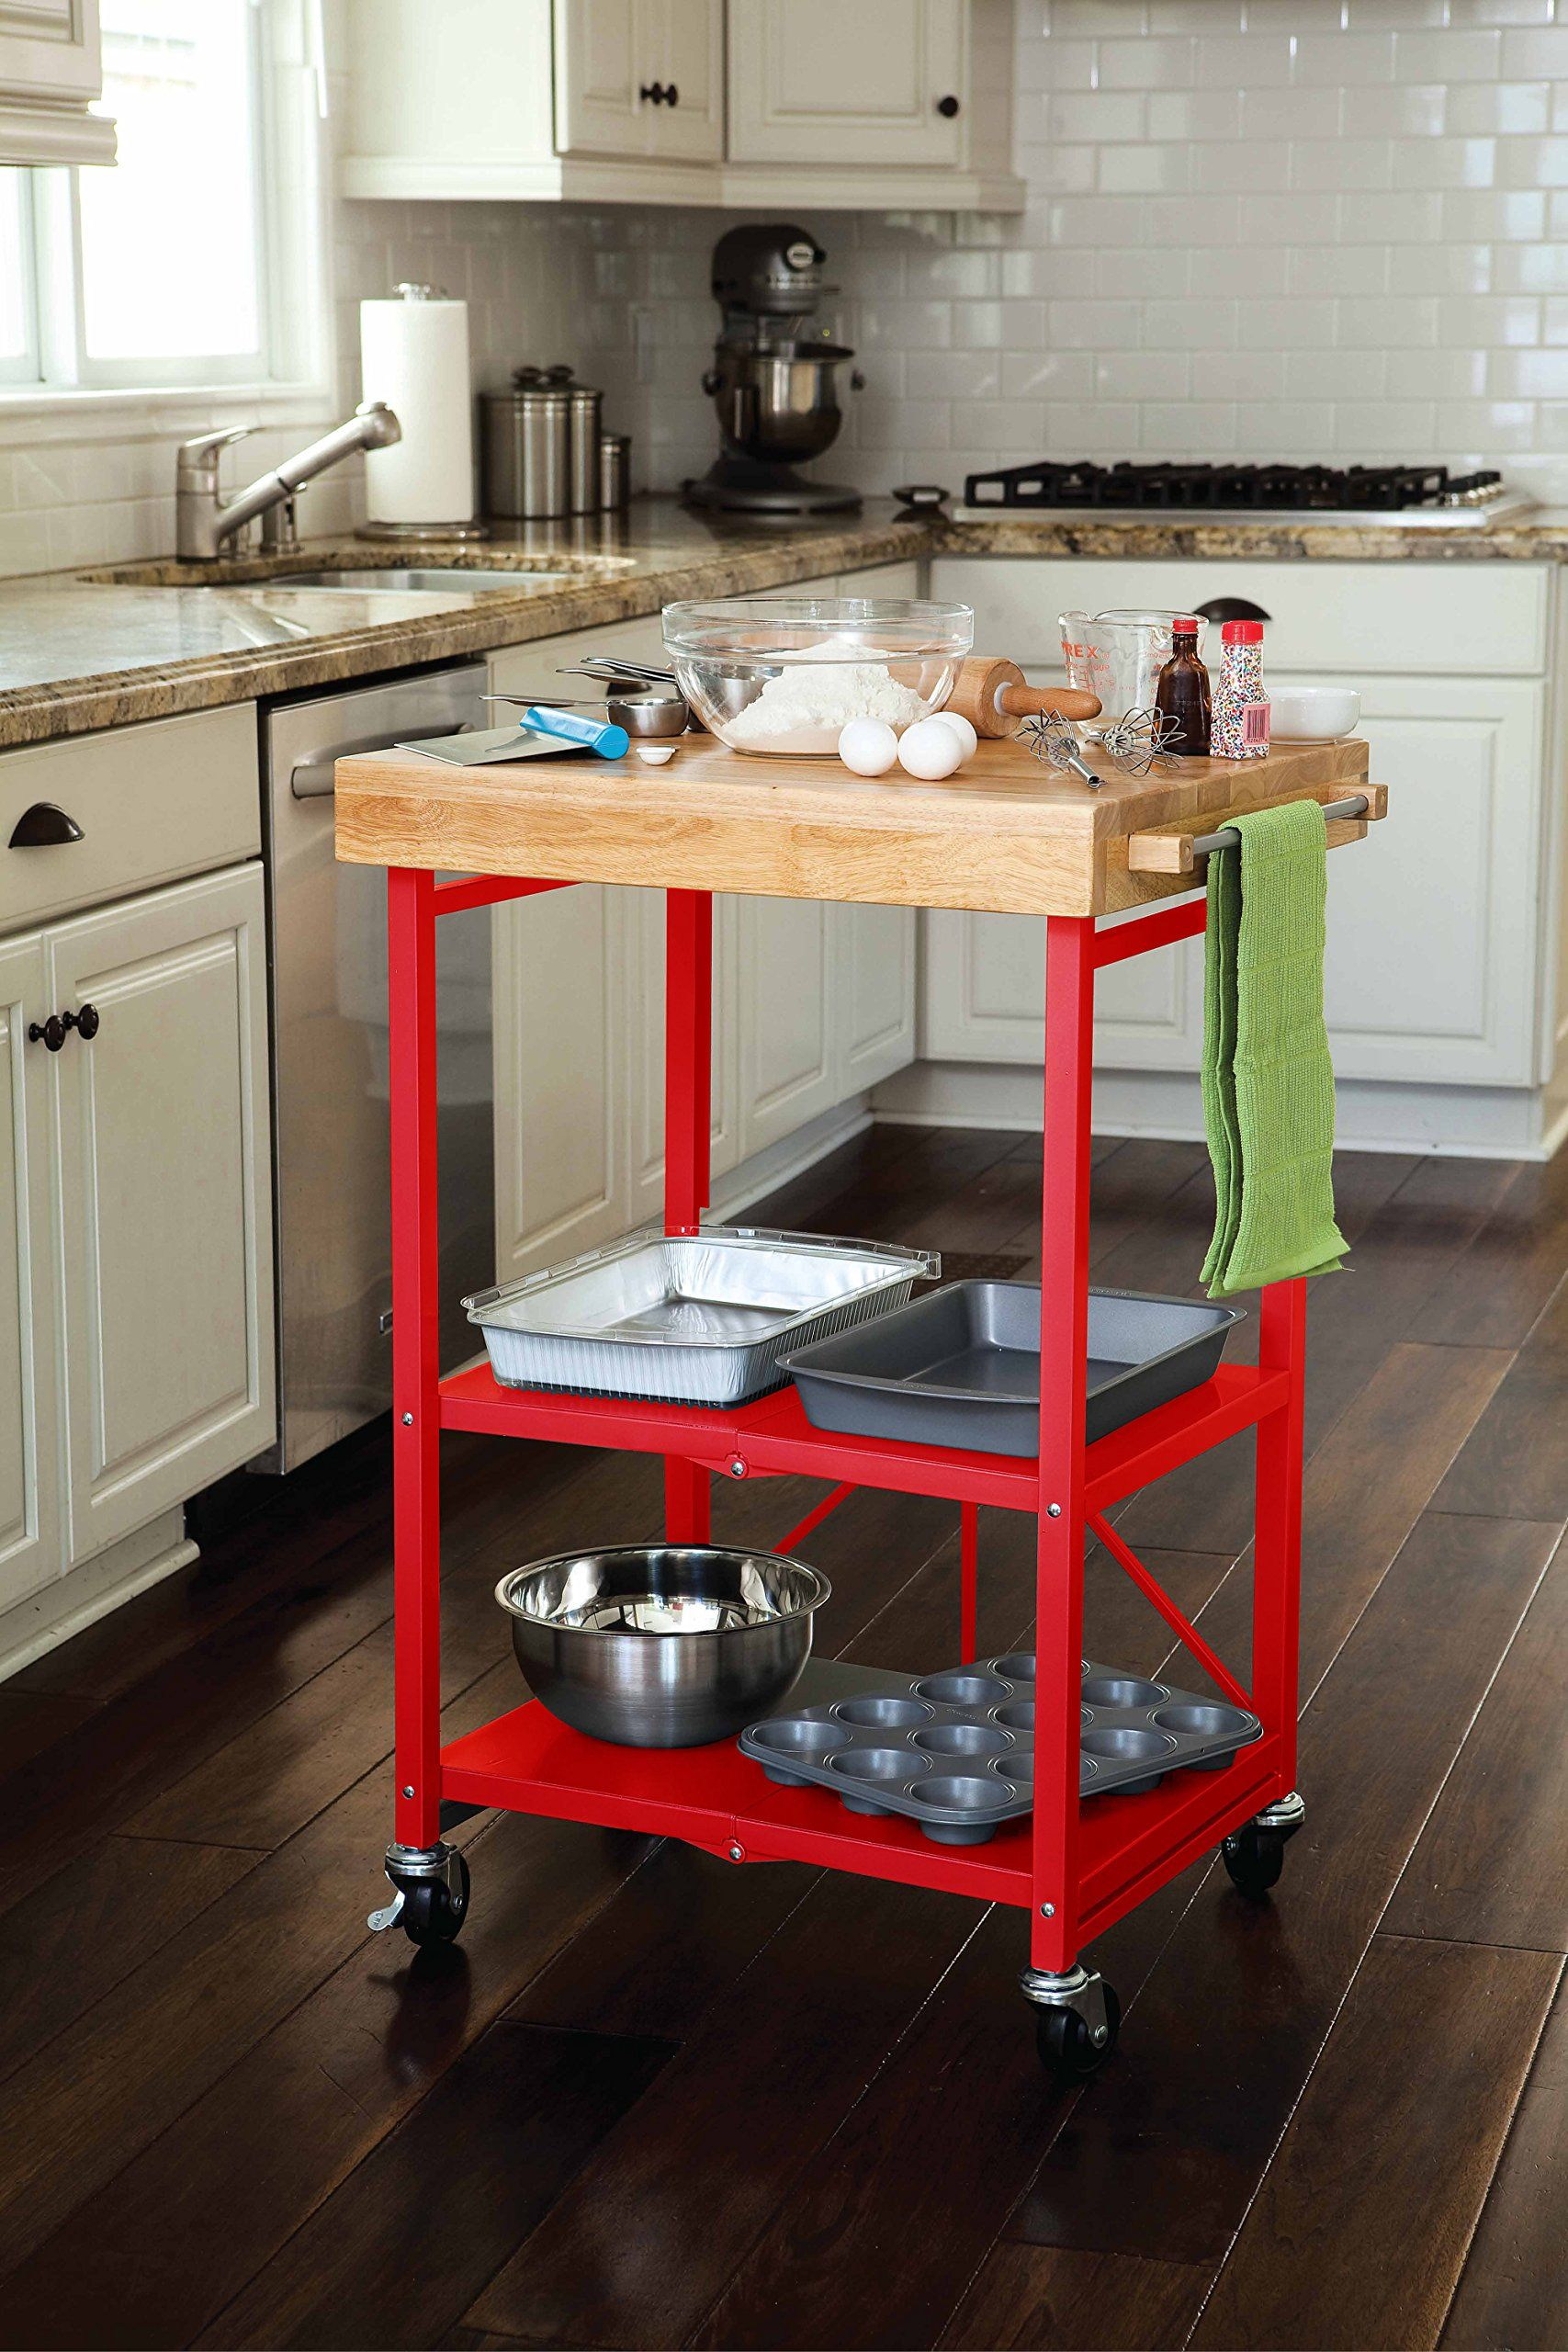 135 Amazon Com Origami Folding Island Kitchen Cart Red